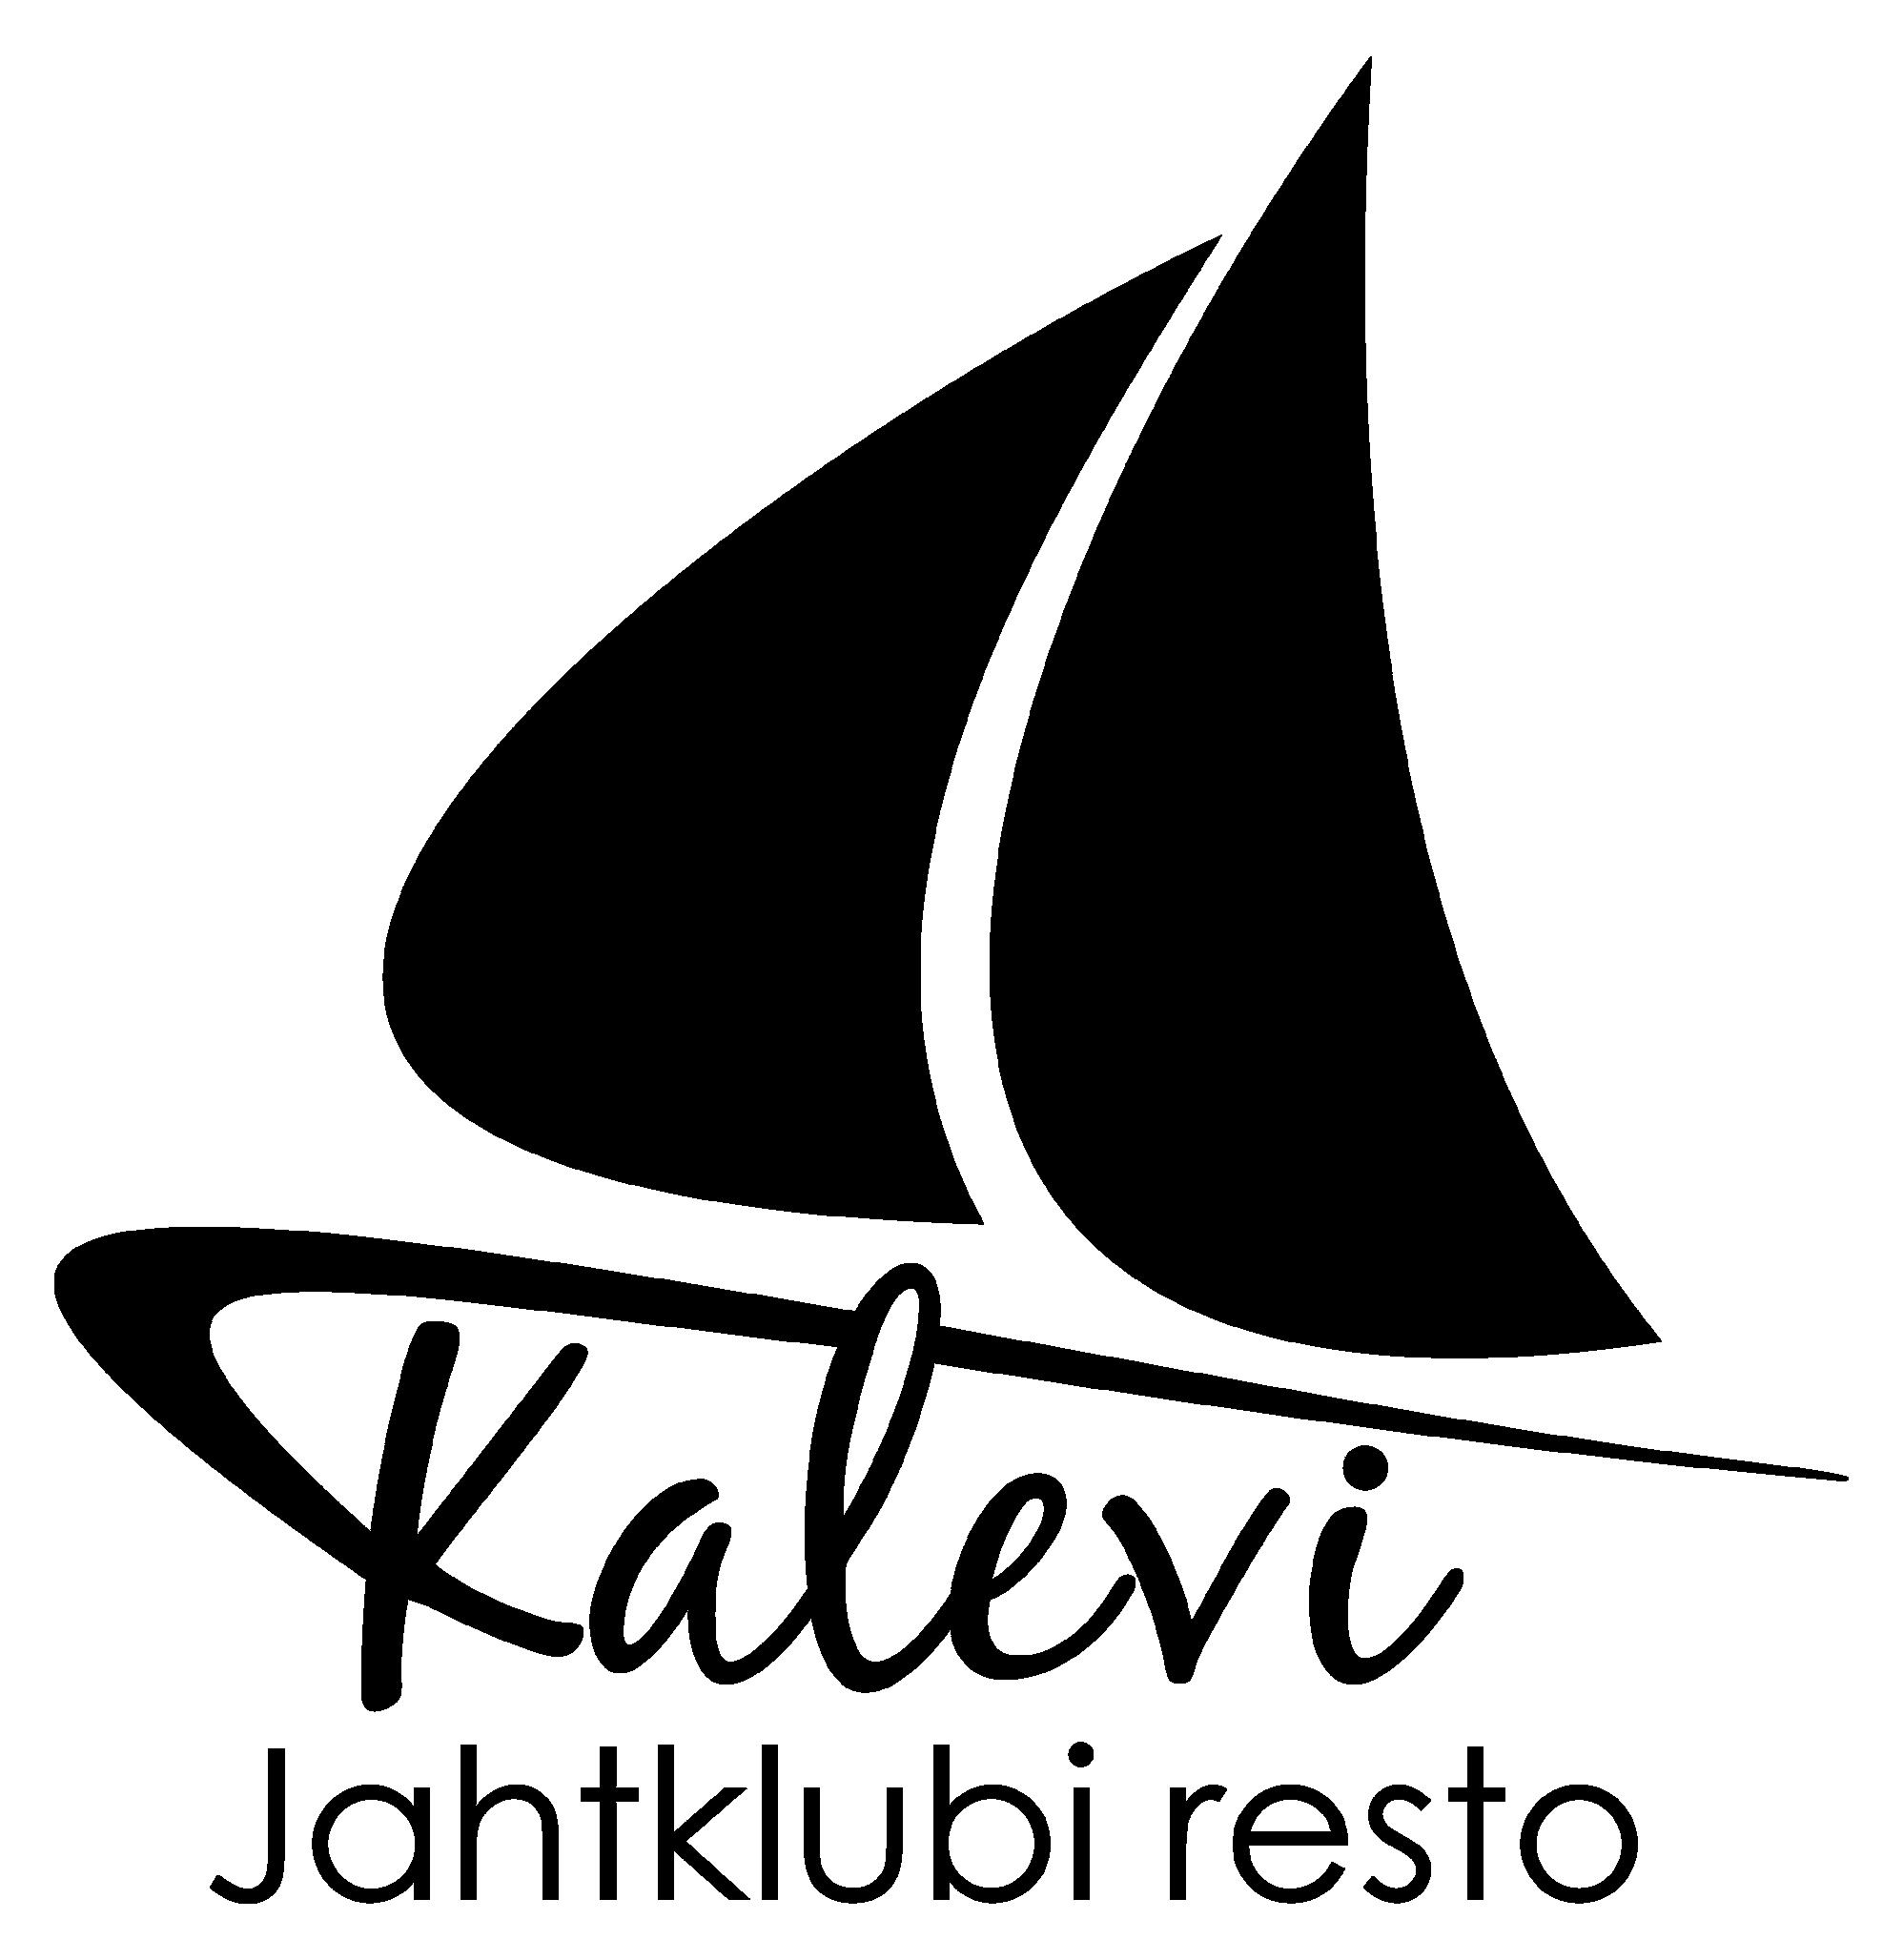 Kalevi Jahtklubi Resto